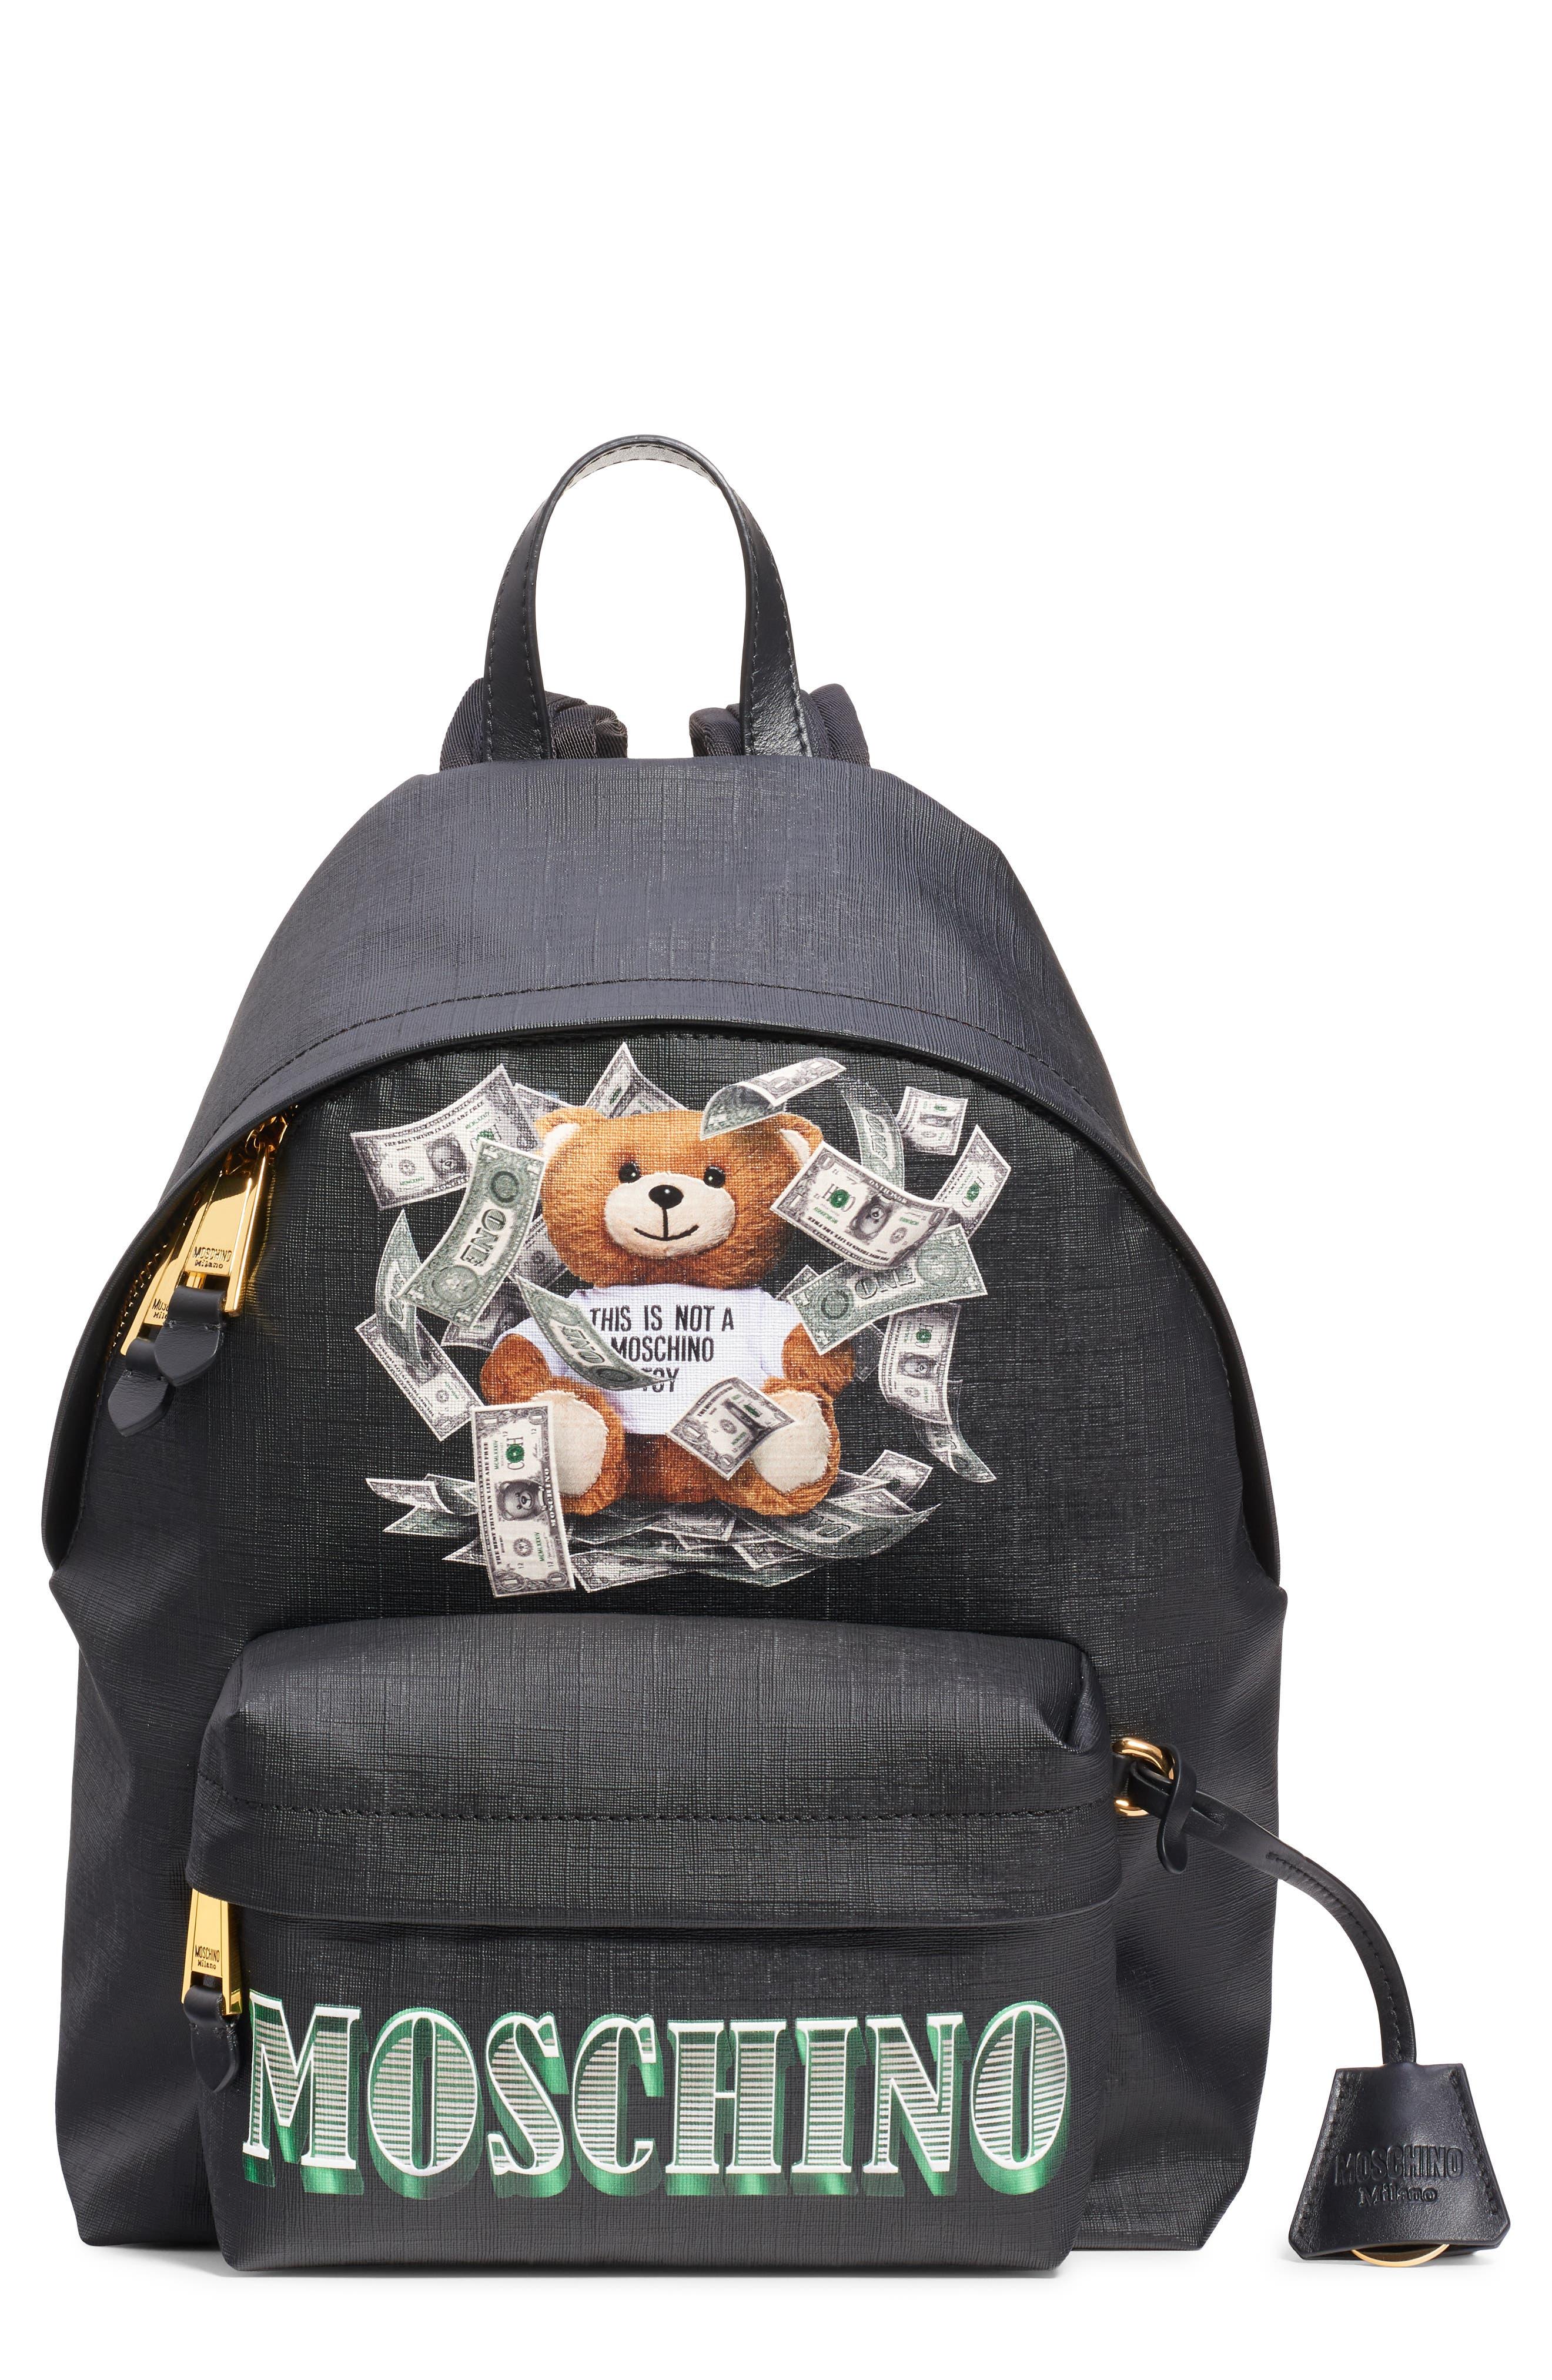 UPC 657536150909 product image for Moschino Money Teddy Backpack - Black | upcitemdb.com